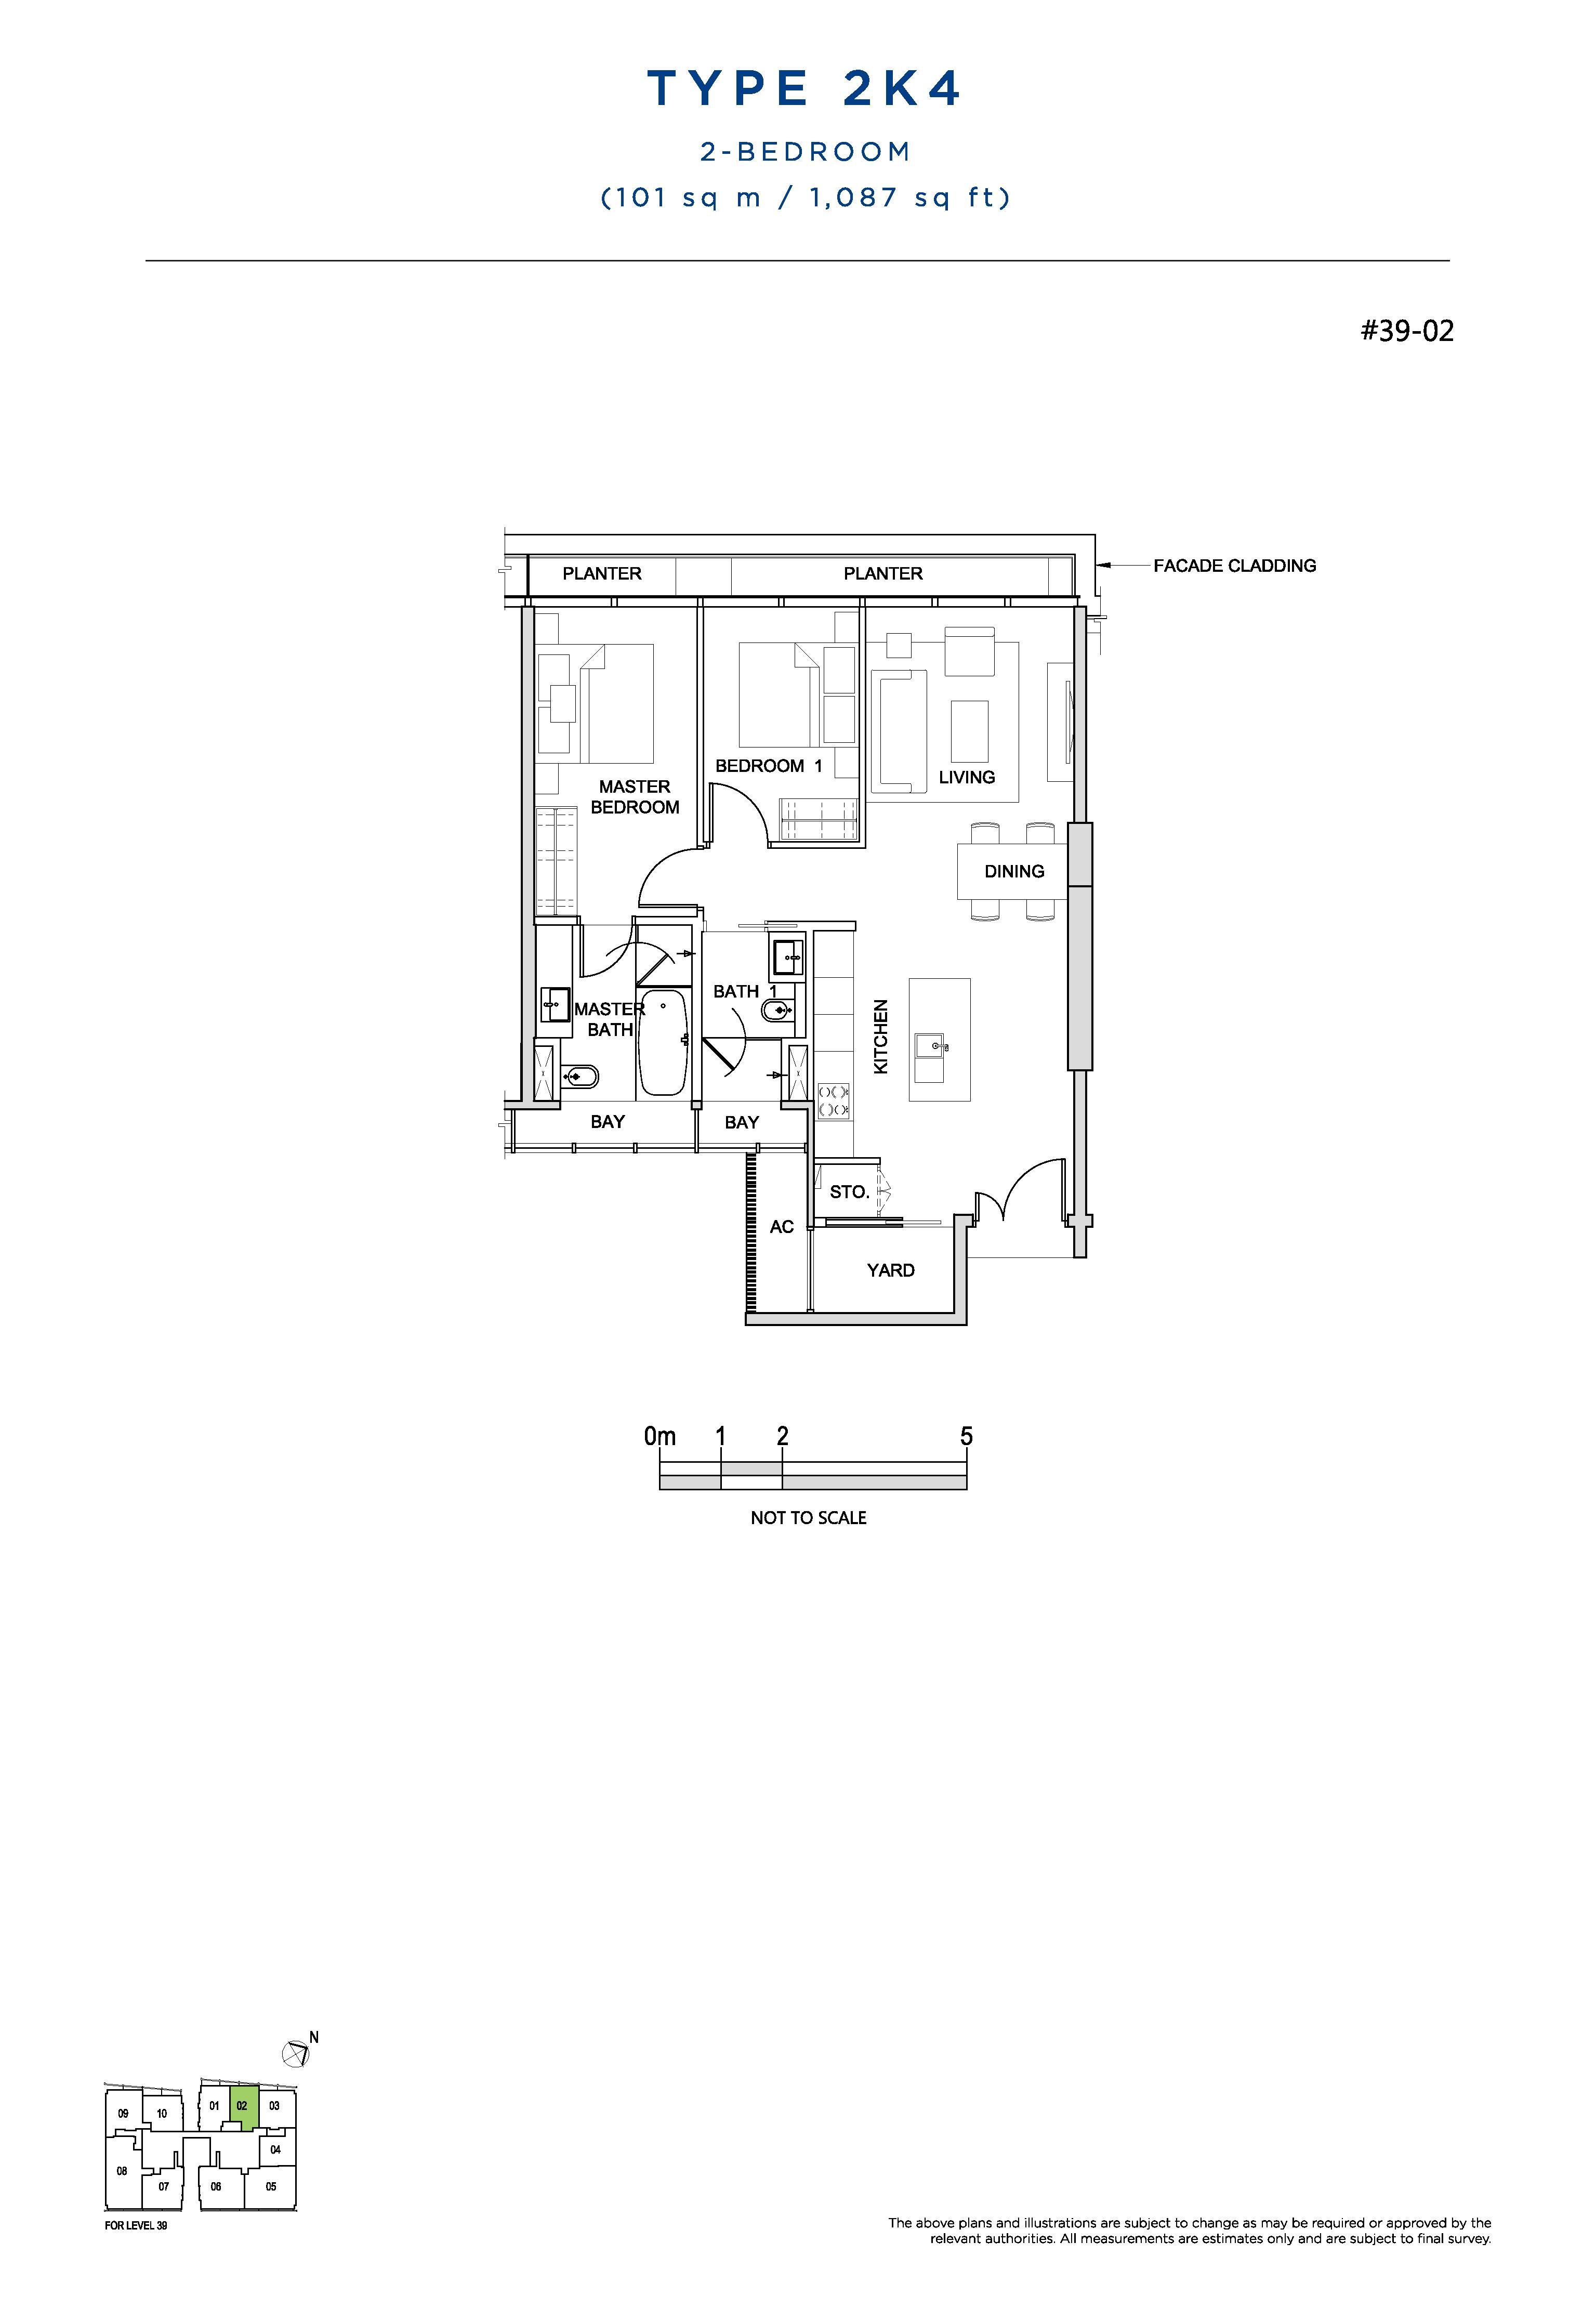 South Beach Residences 2 Bedroom Floor Plans Type 2K4